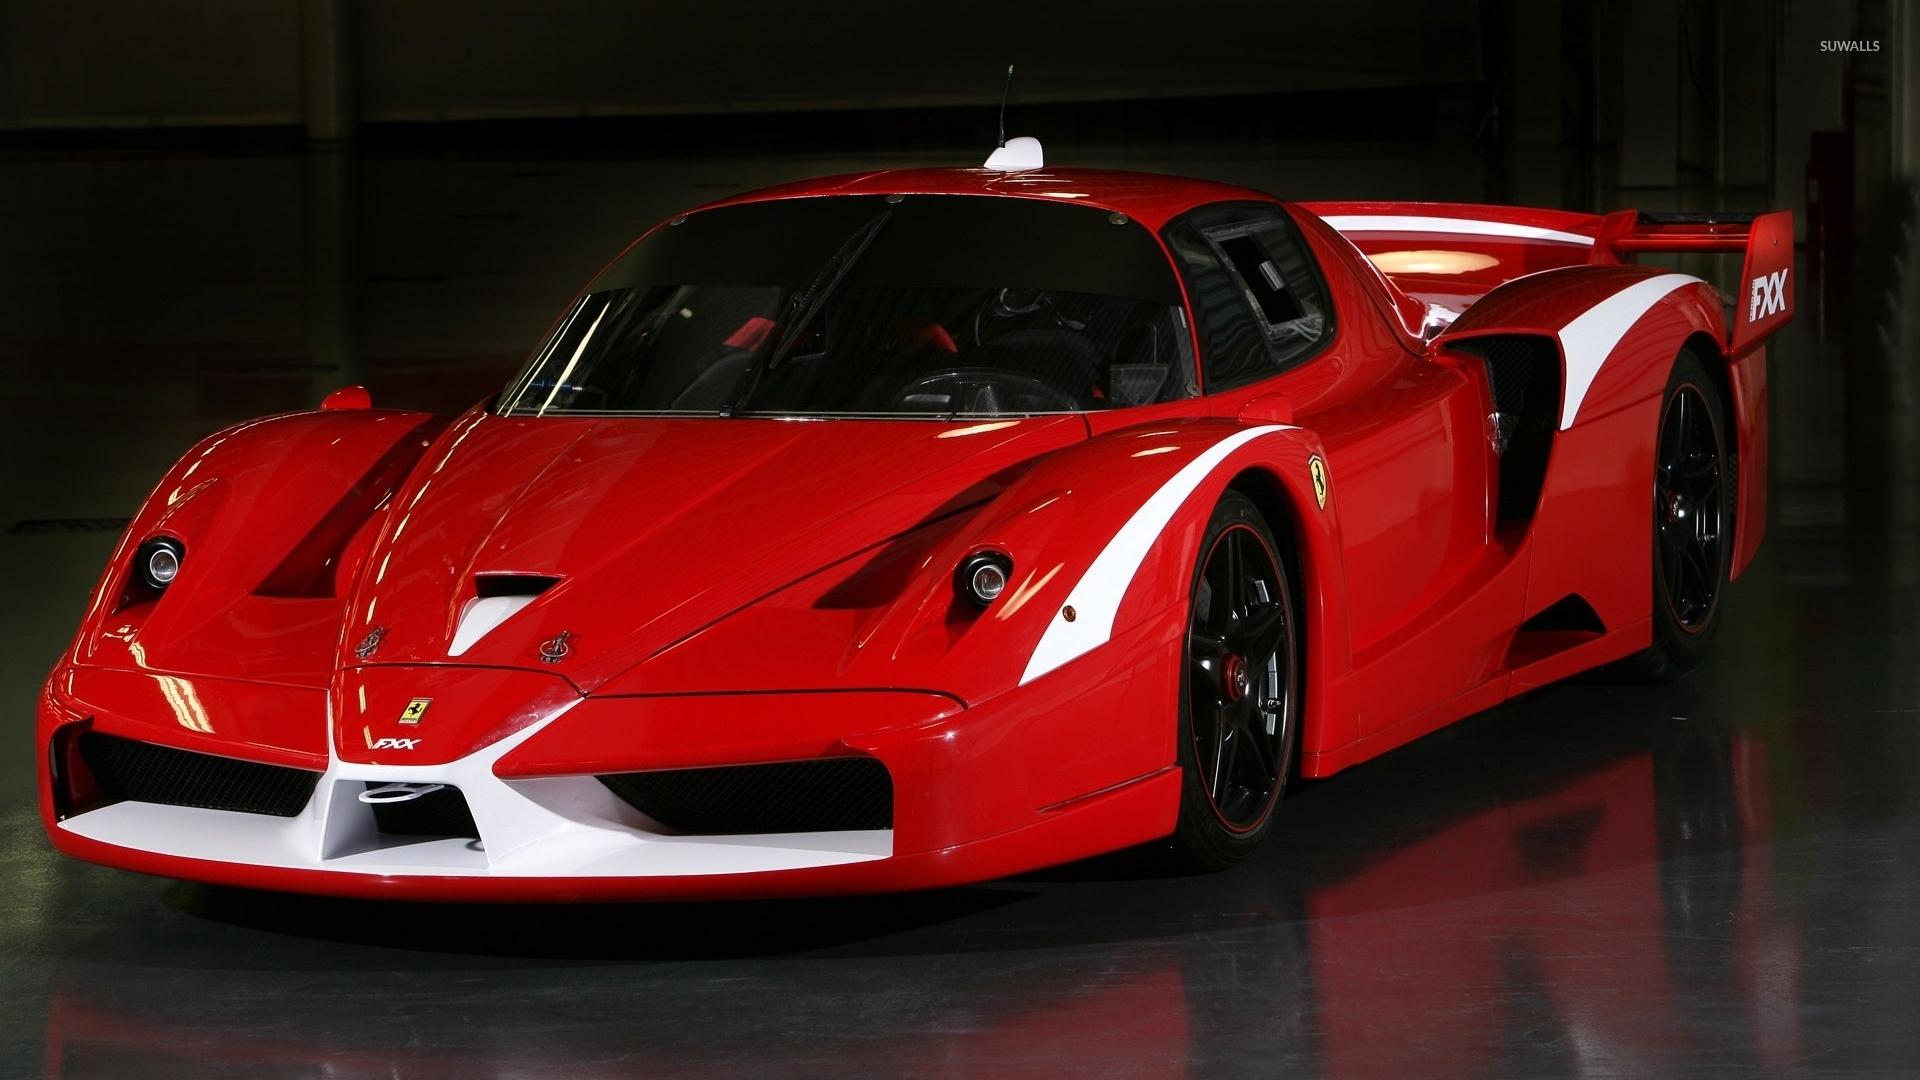 Ferrari Fxx Wallpaper Car Wallpapers 9587